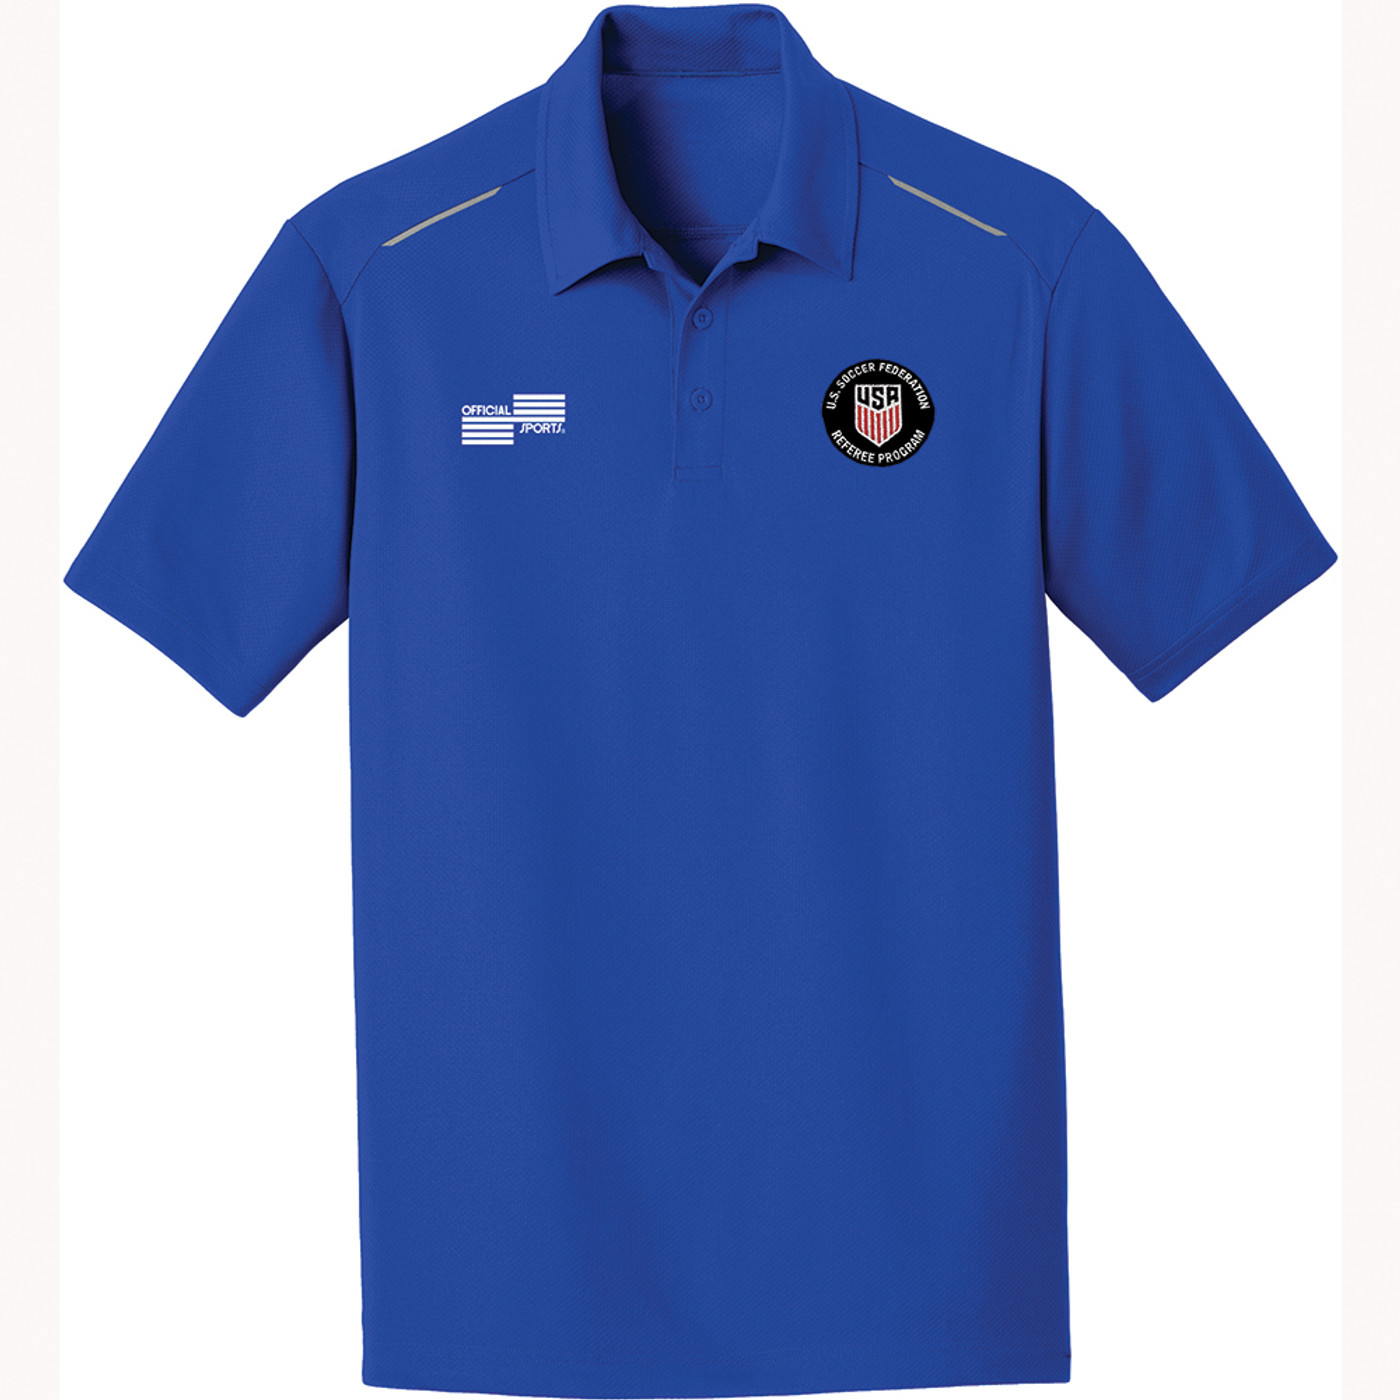 2404CL USSF Performance Golf Shirt